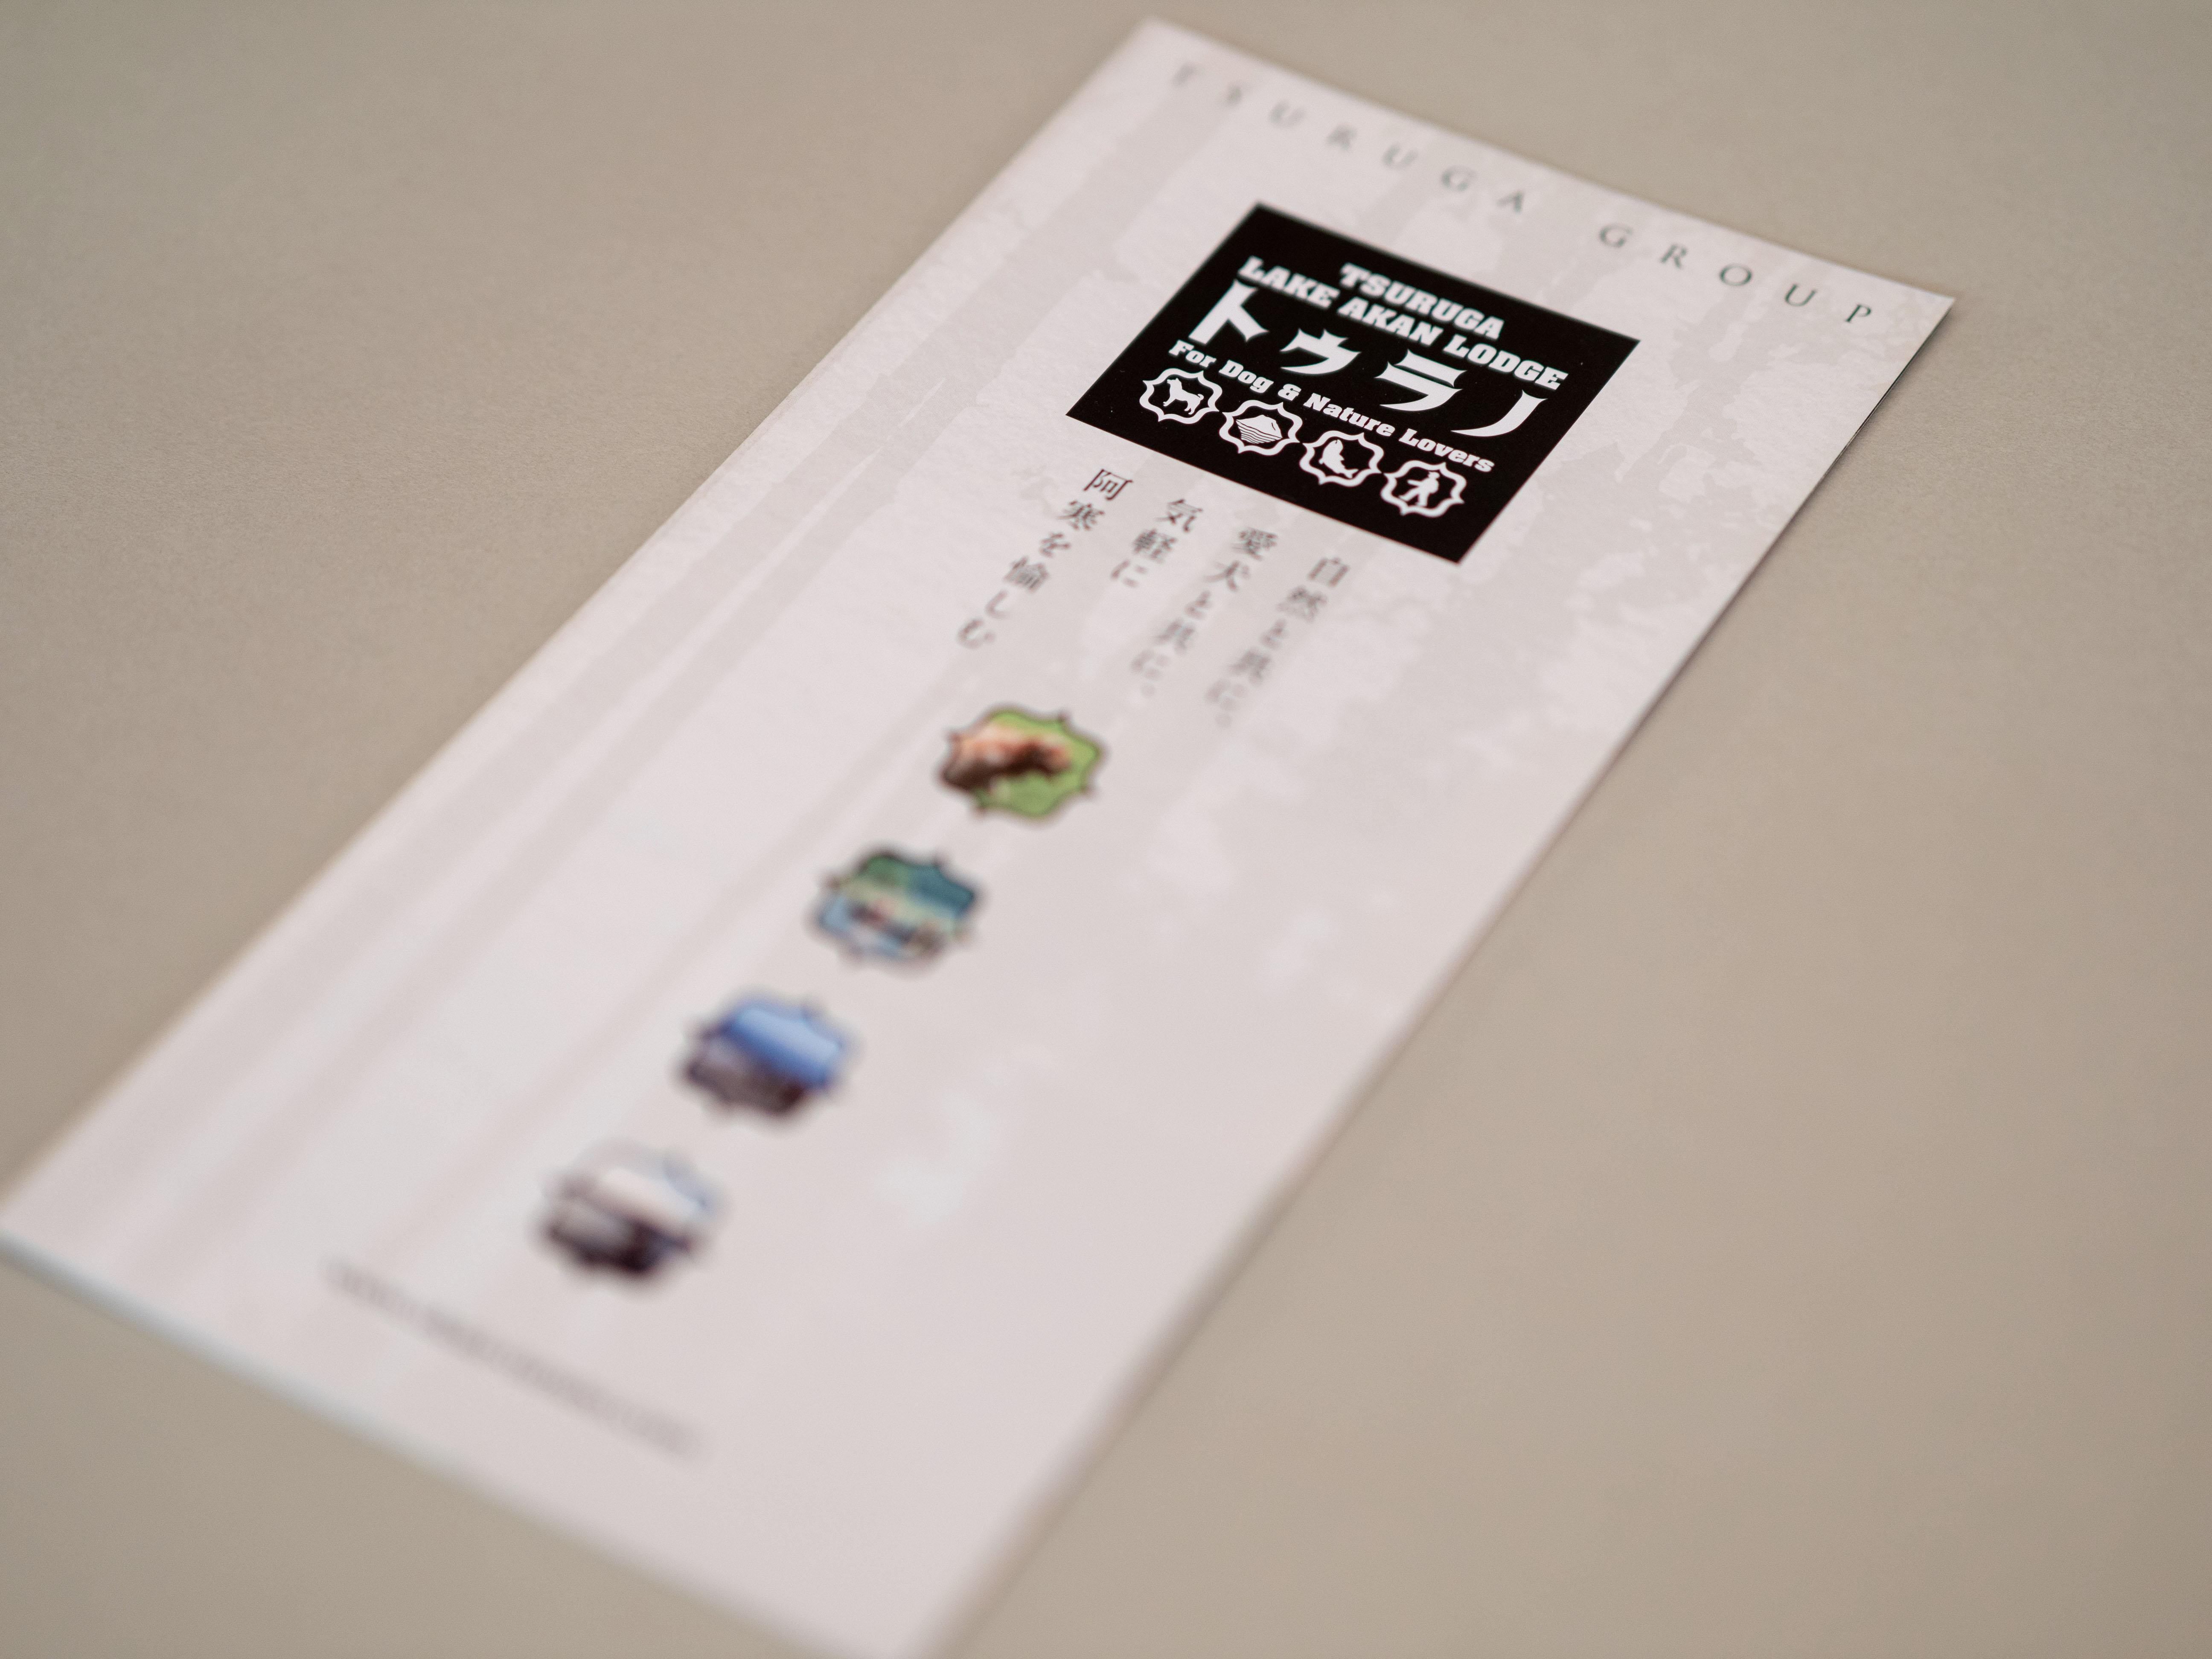 <span>Pamphlet</span><br>鶴雅グループ<br>鶴雅 レイク阿寒ロッジ トゥラノ